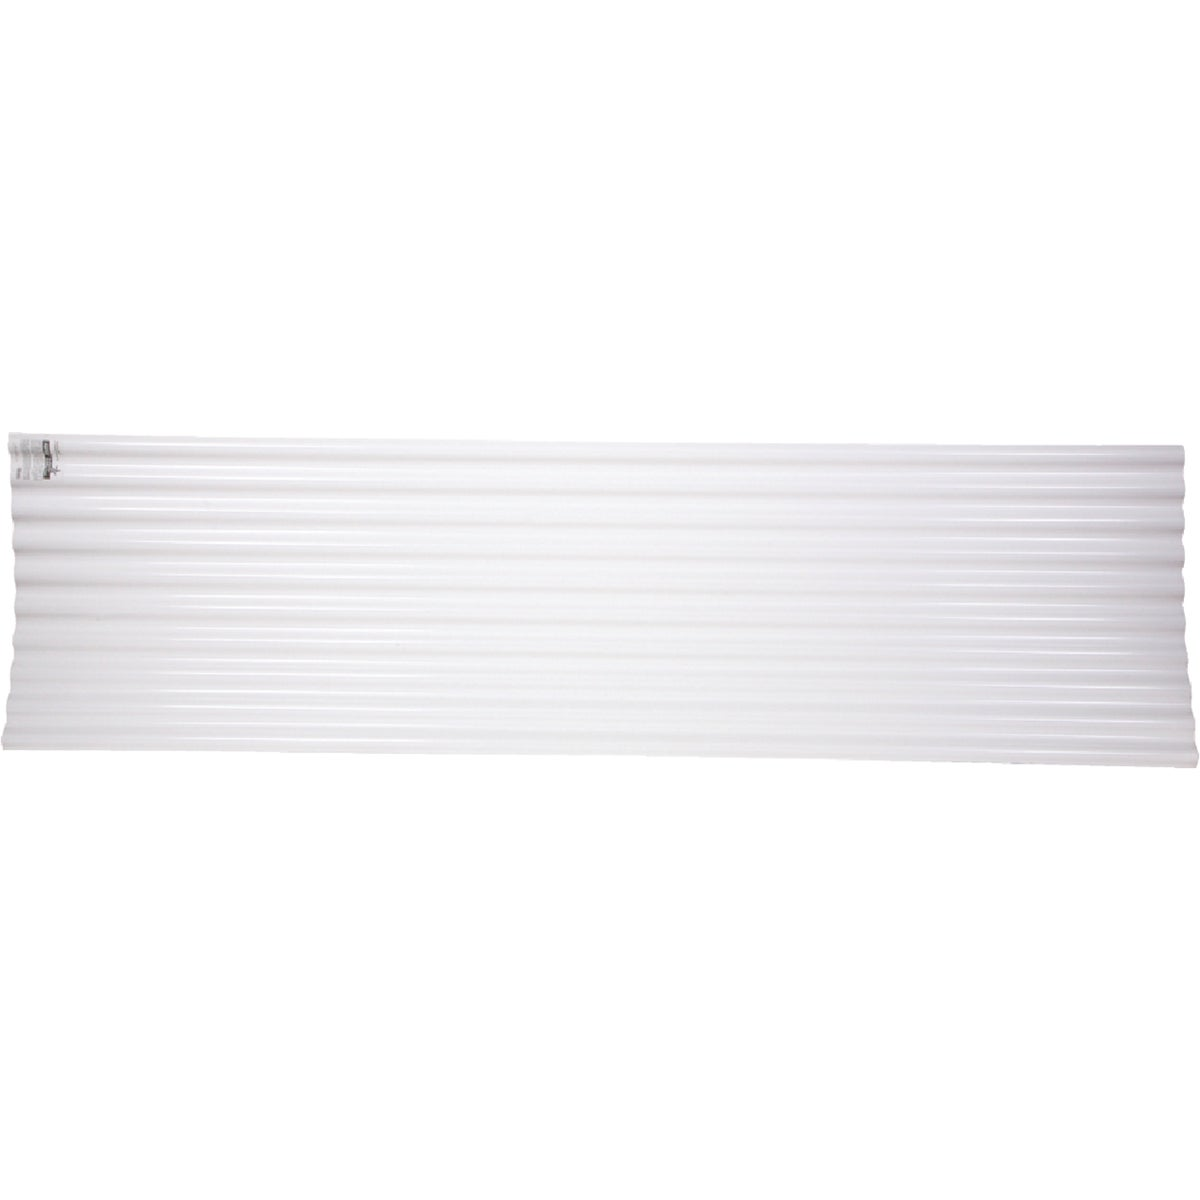 8' WHT CORGTD PVC PANEL - 120115 by Ofic North America